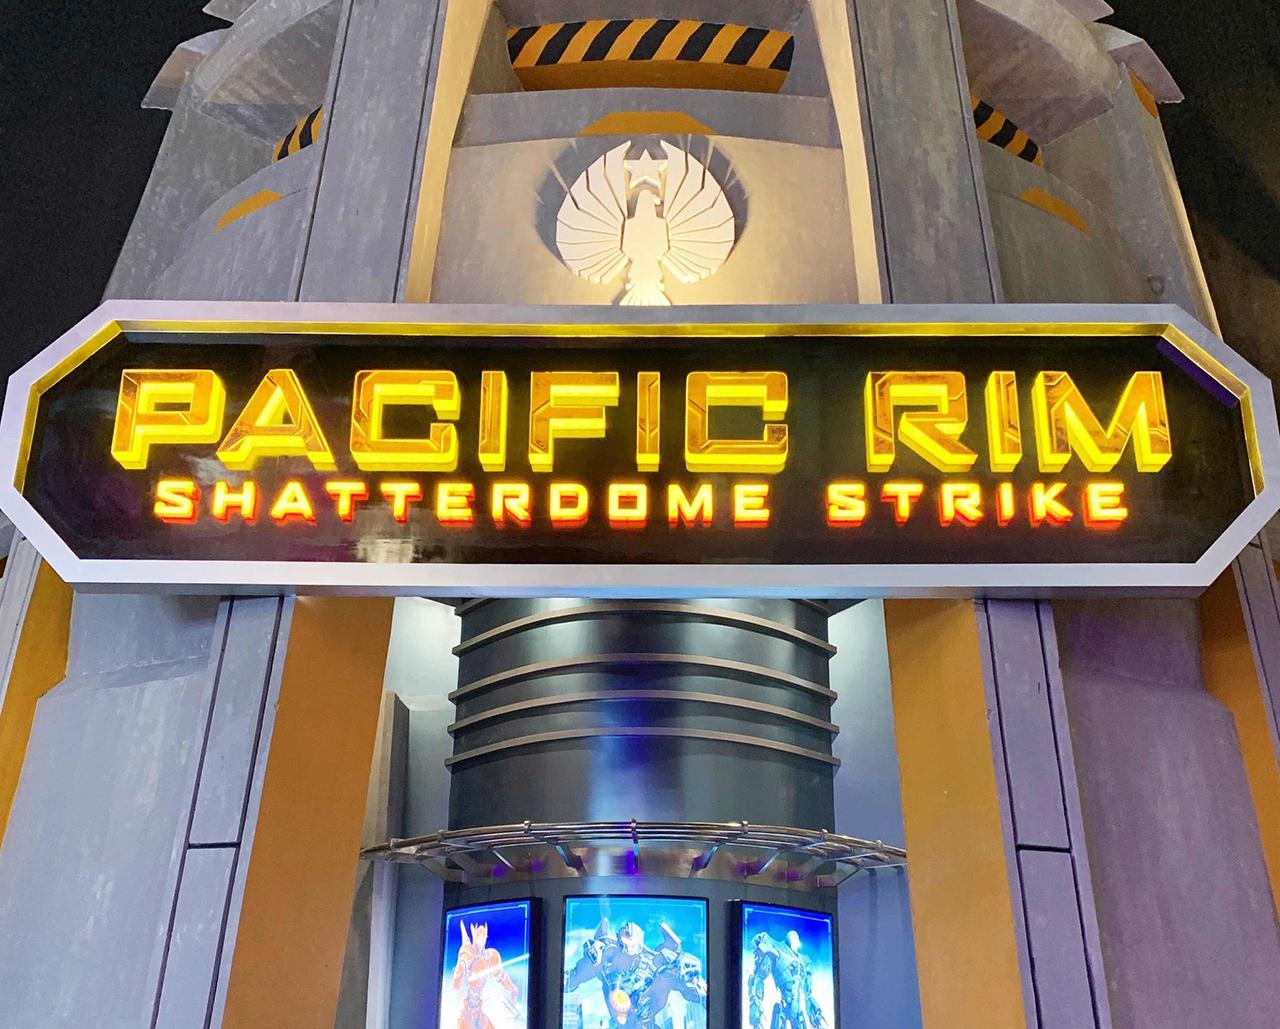 Trans Studio Cibubur Pacific Rim: Shatterdome Strike